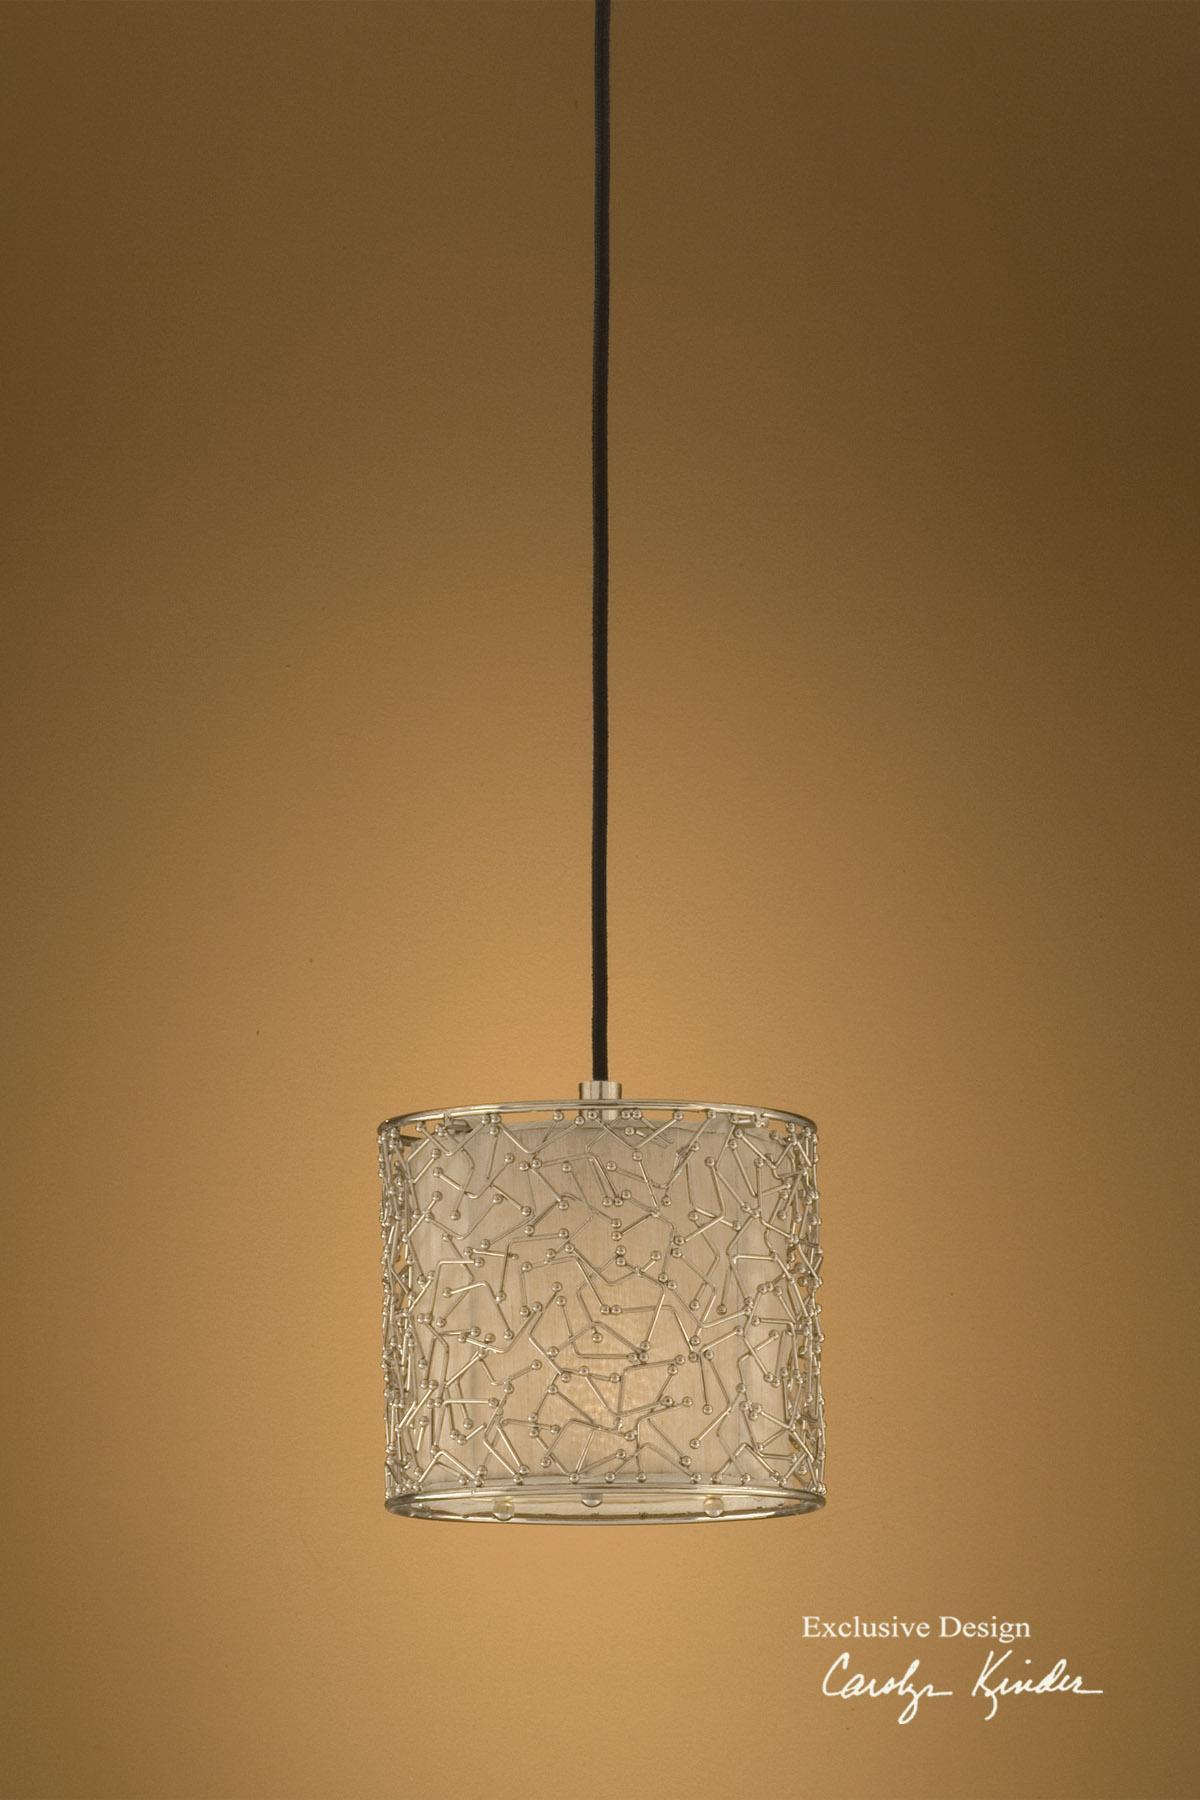 Uttermost Lighting Fixtures Brandon Silver 1 Light Mini Hanging Shade - Item Number: 21856